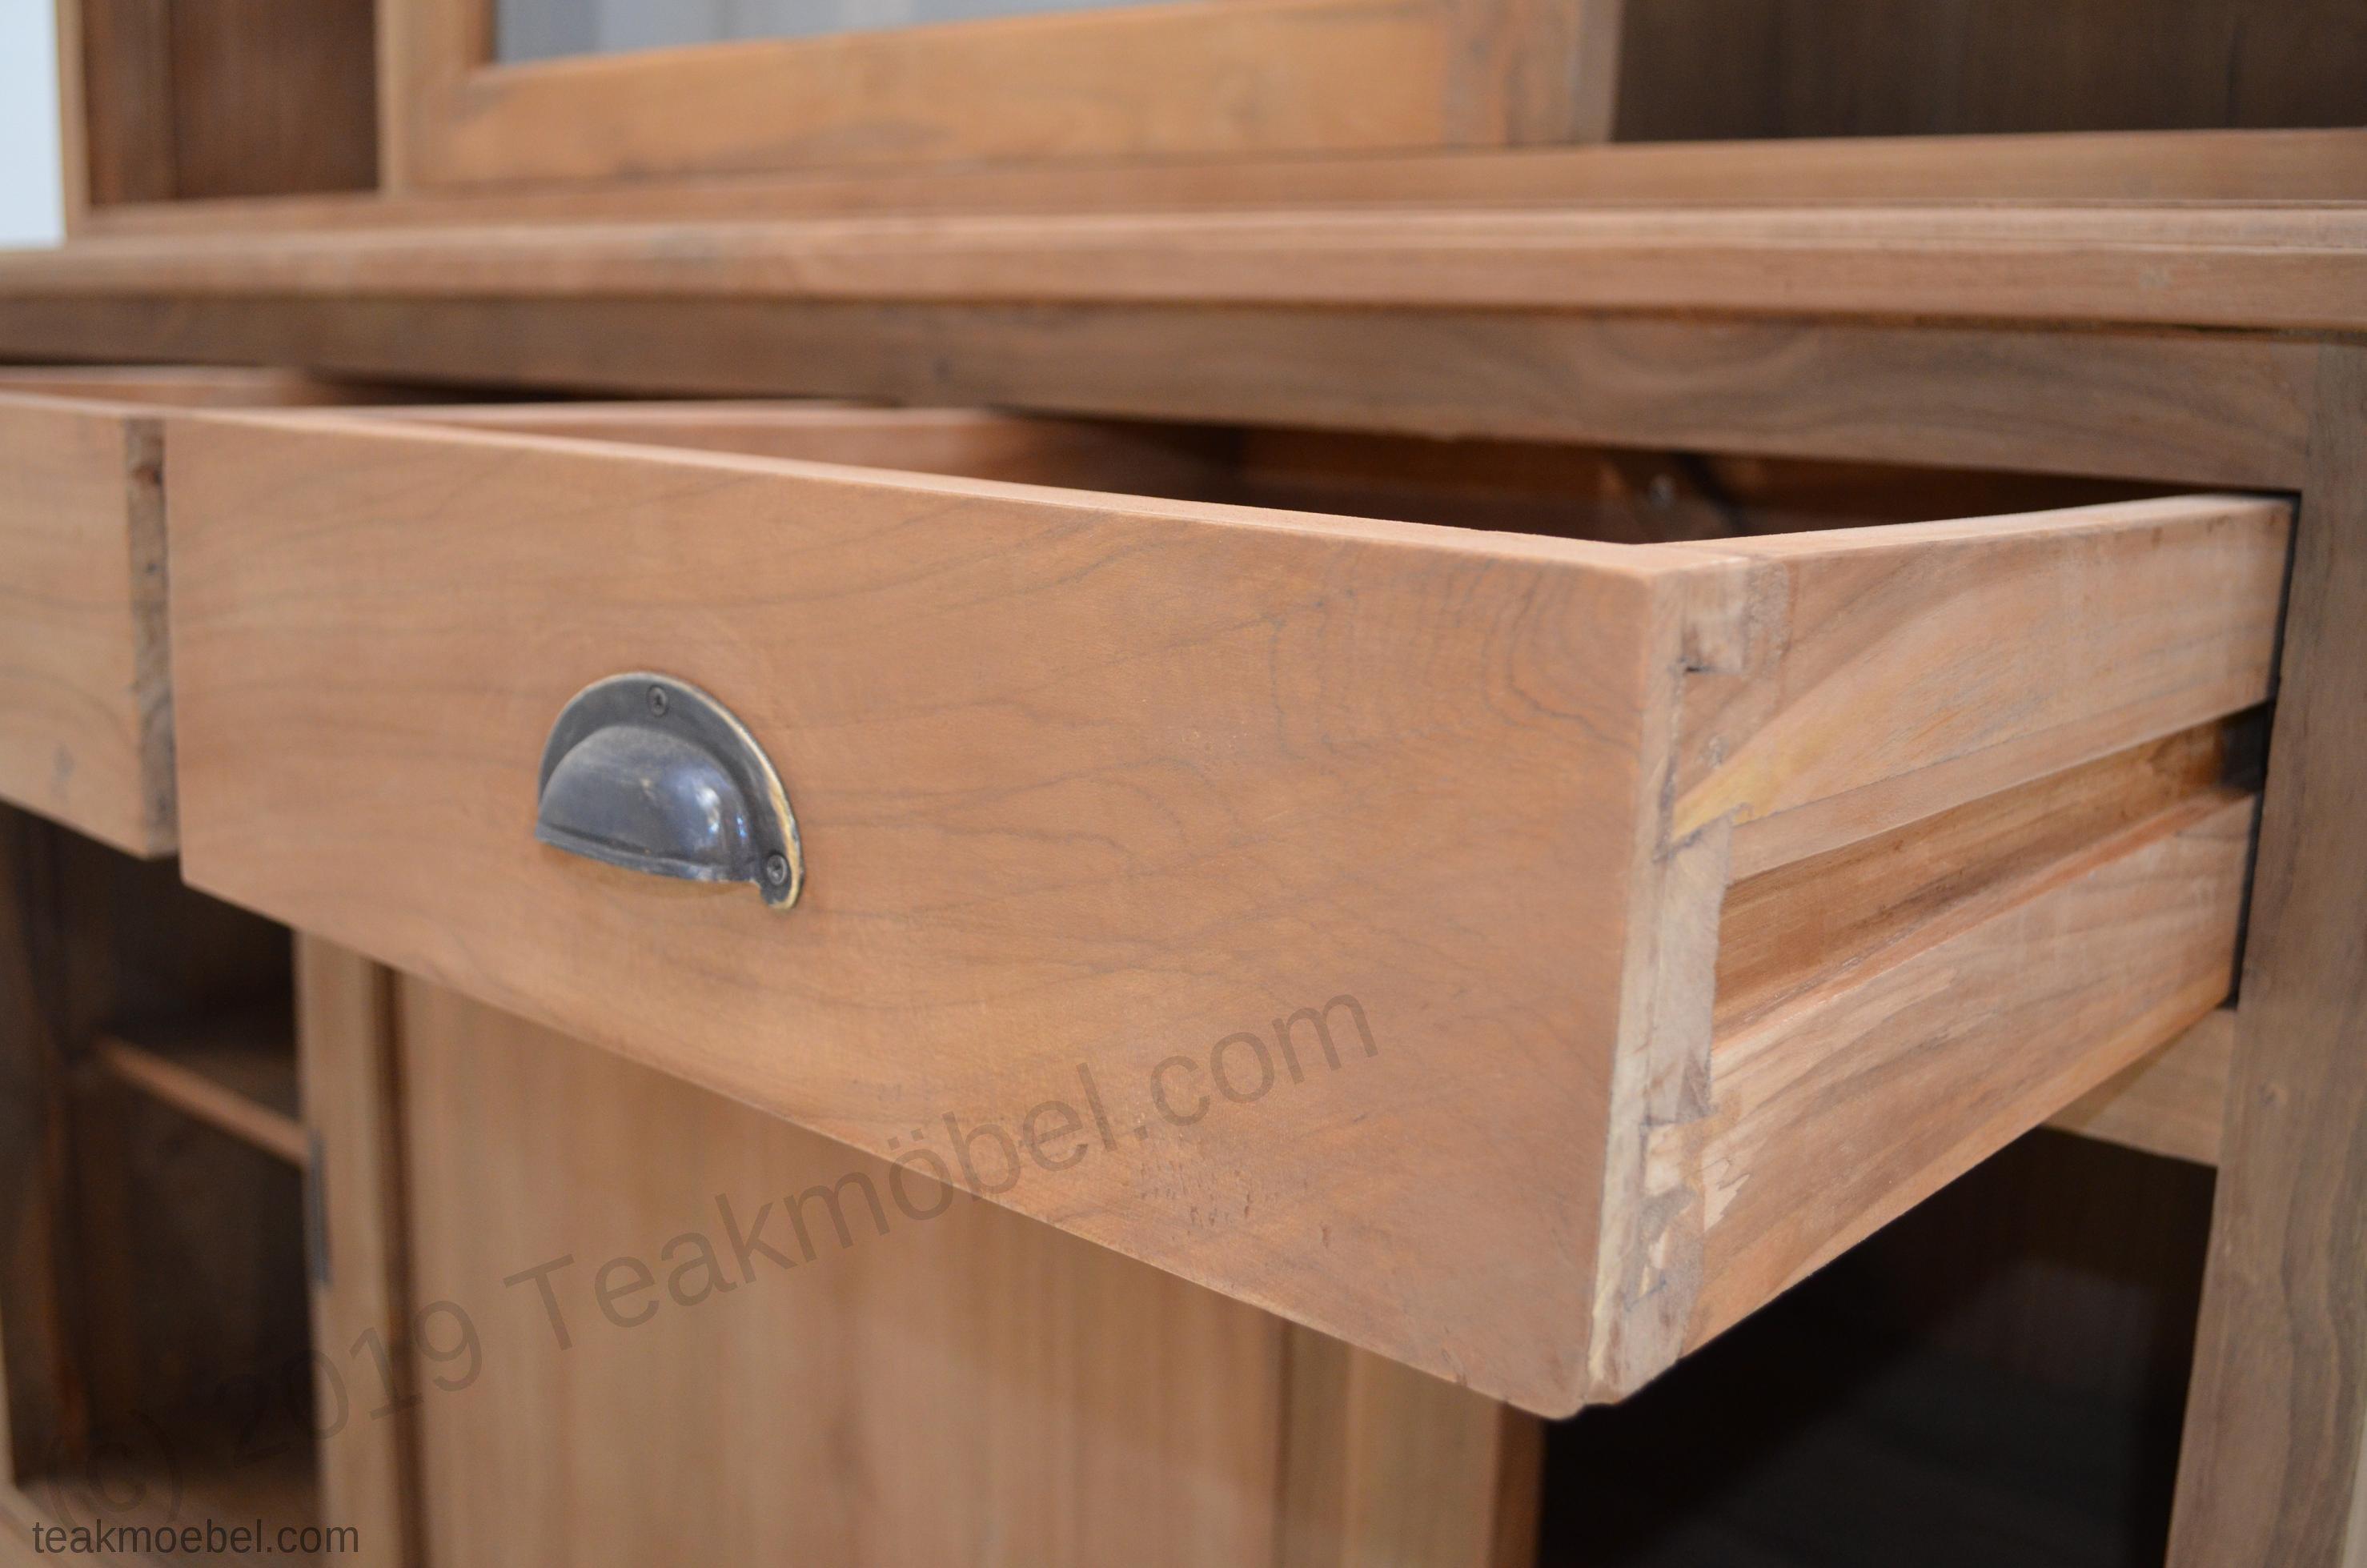 teak buffetschrank 140cm teakm. Black Bedroom Furniture Sets. Home Design Ideas